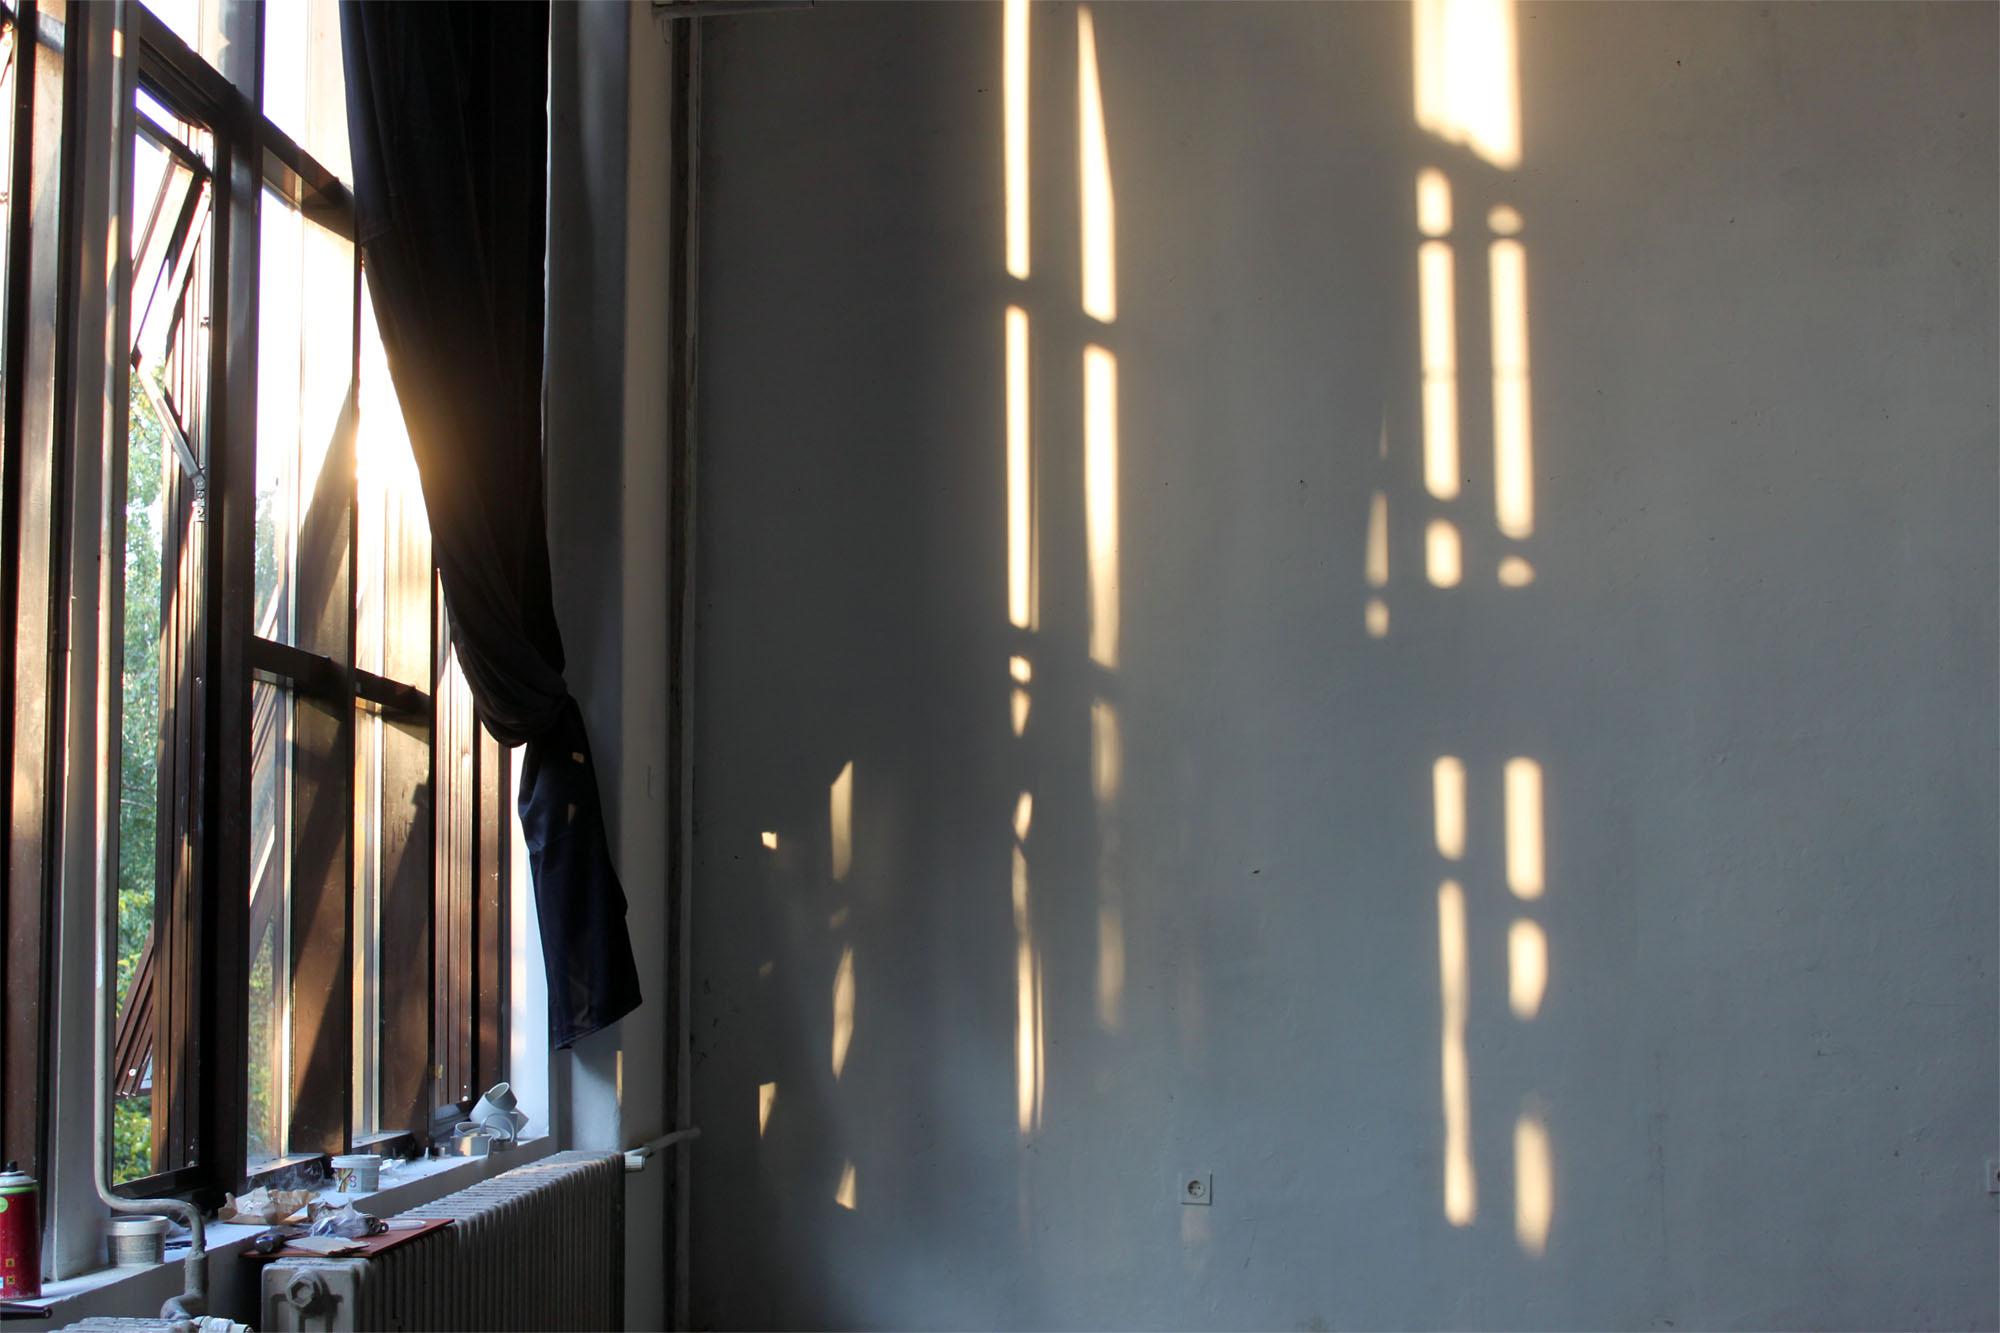 studio_sm_0011_sunshine_in_the_studio